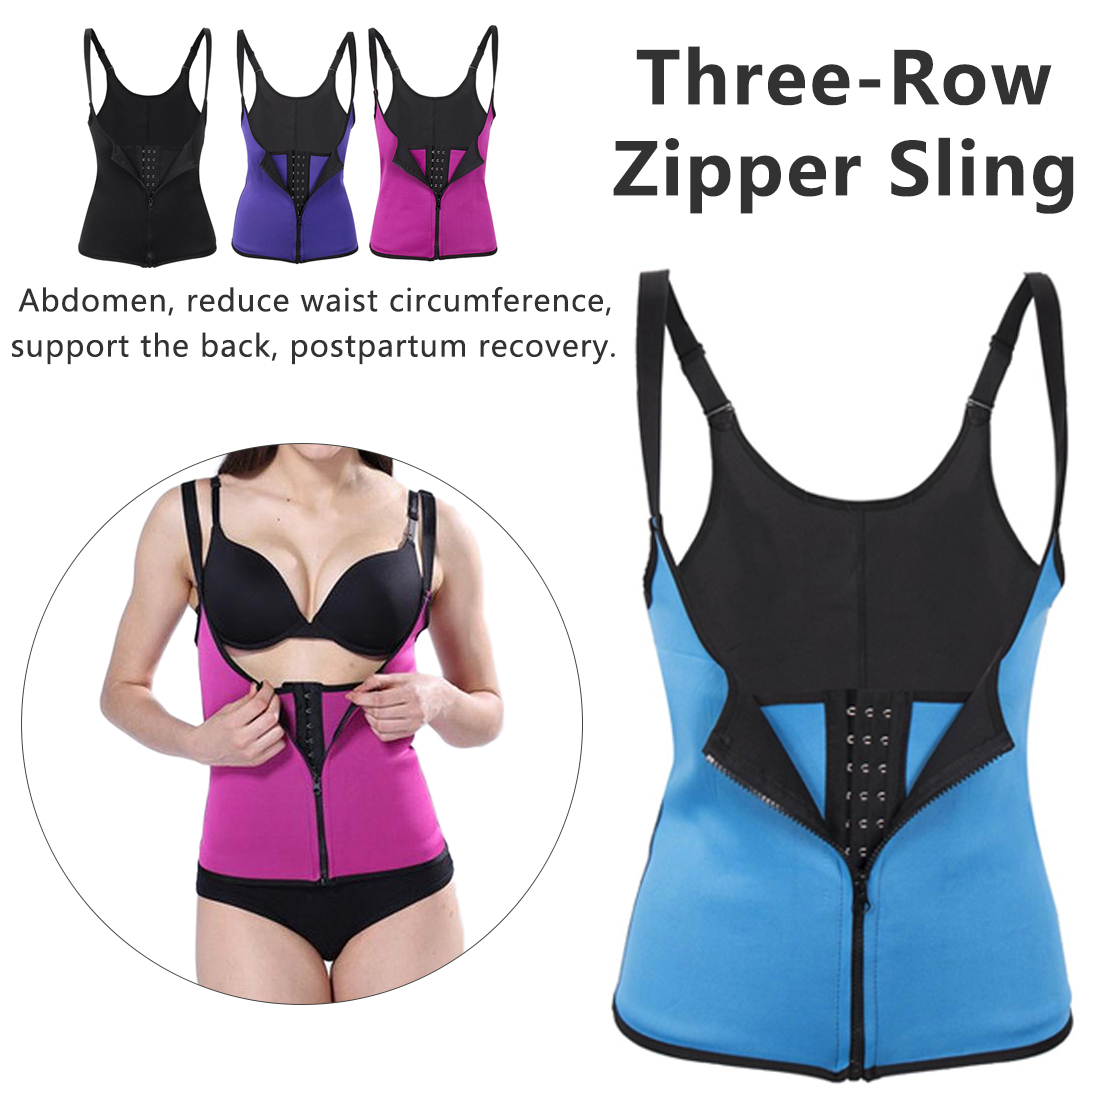 Shoulder Strap Waist Trainer Slimming Belt Vest Corset Women Zipper Hook Body Shaper Waist Slimming  Women's Tight Corset